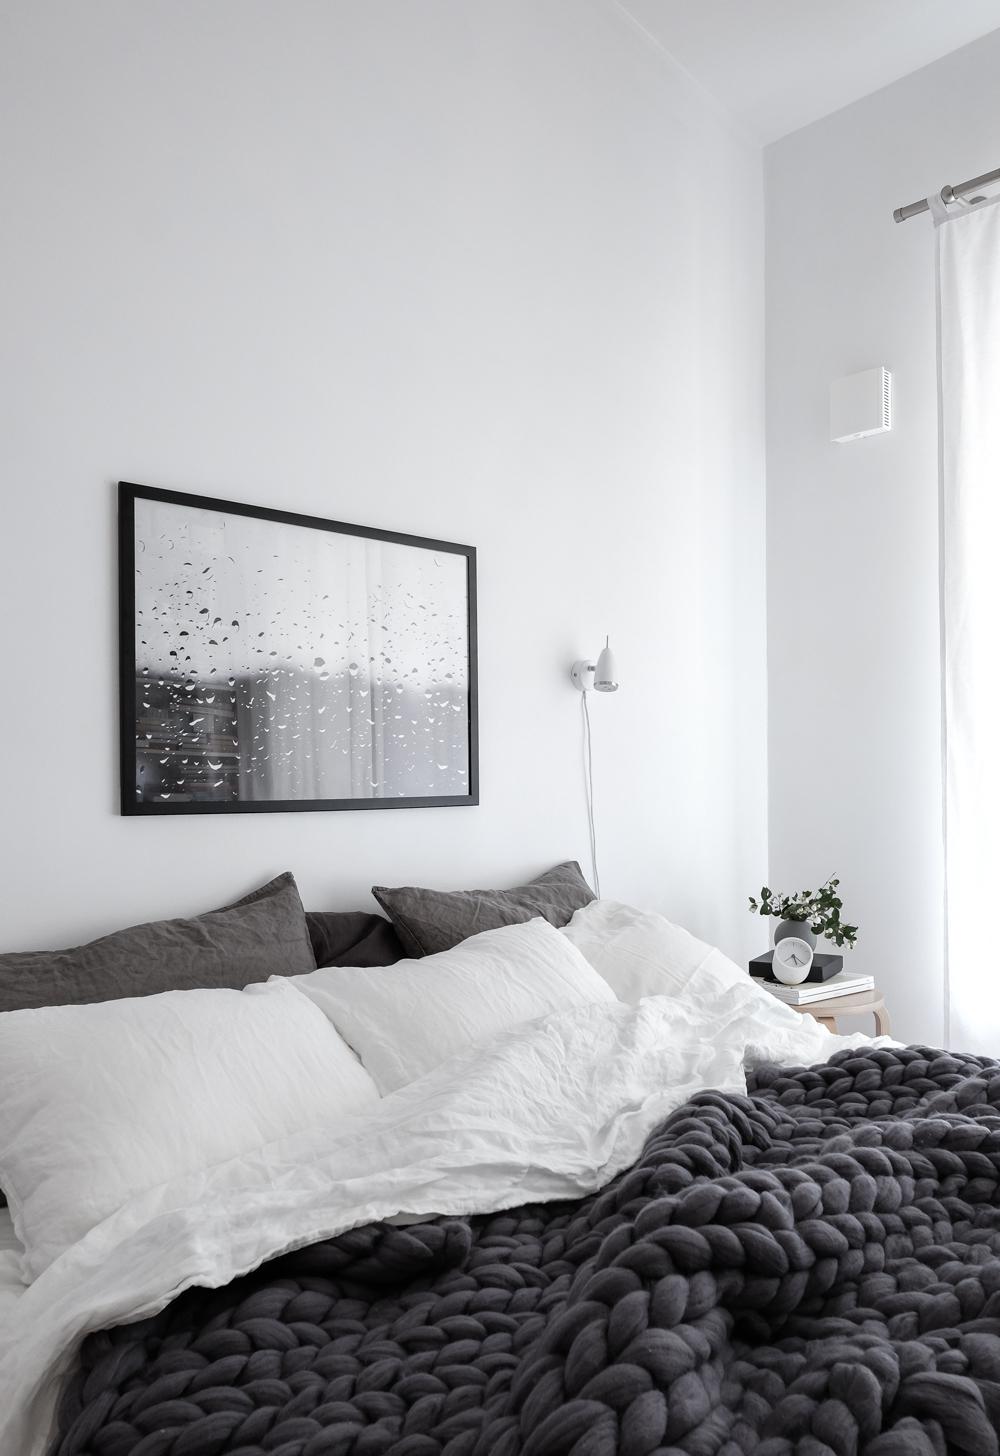 Scandinavian-style-bedroom-with-linen-bedding-Ohhio-chunky-merino-wool-blanket-and-Rainy-Day-print-by-Anu-Tammiste-1 copy.jpg